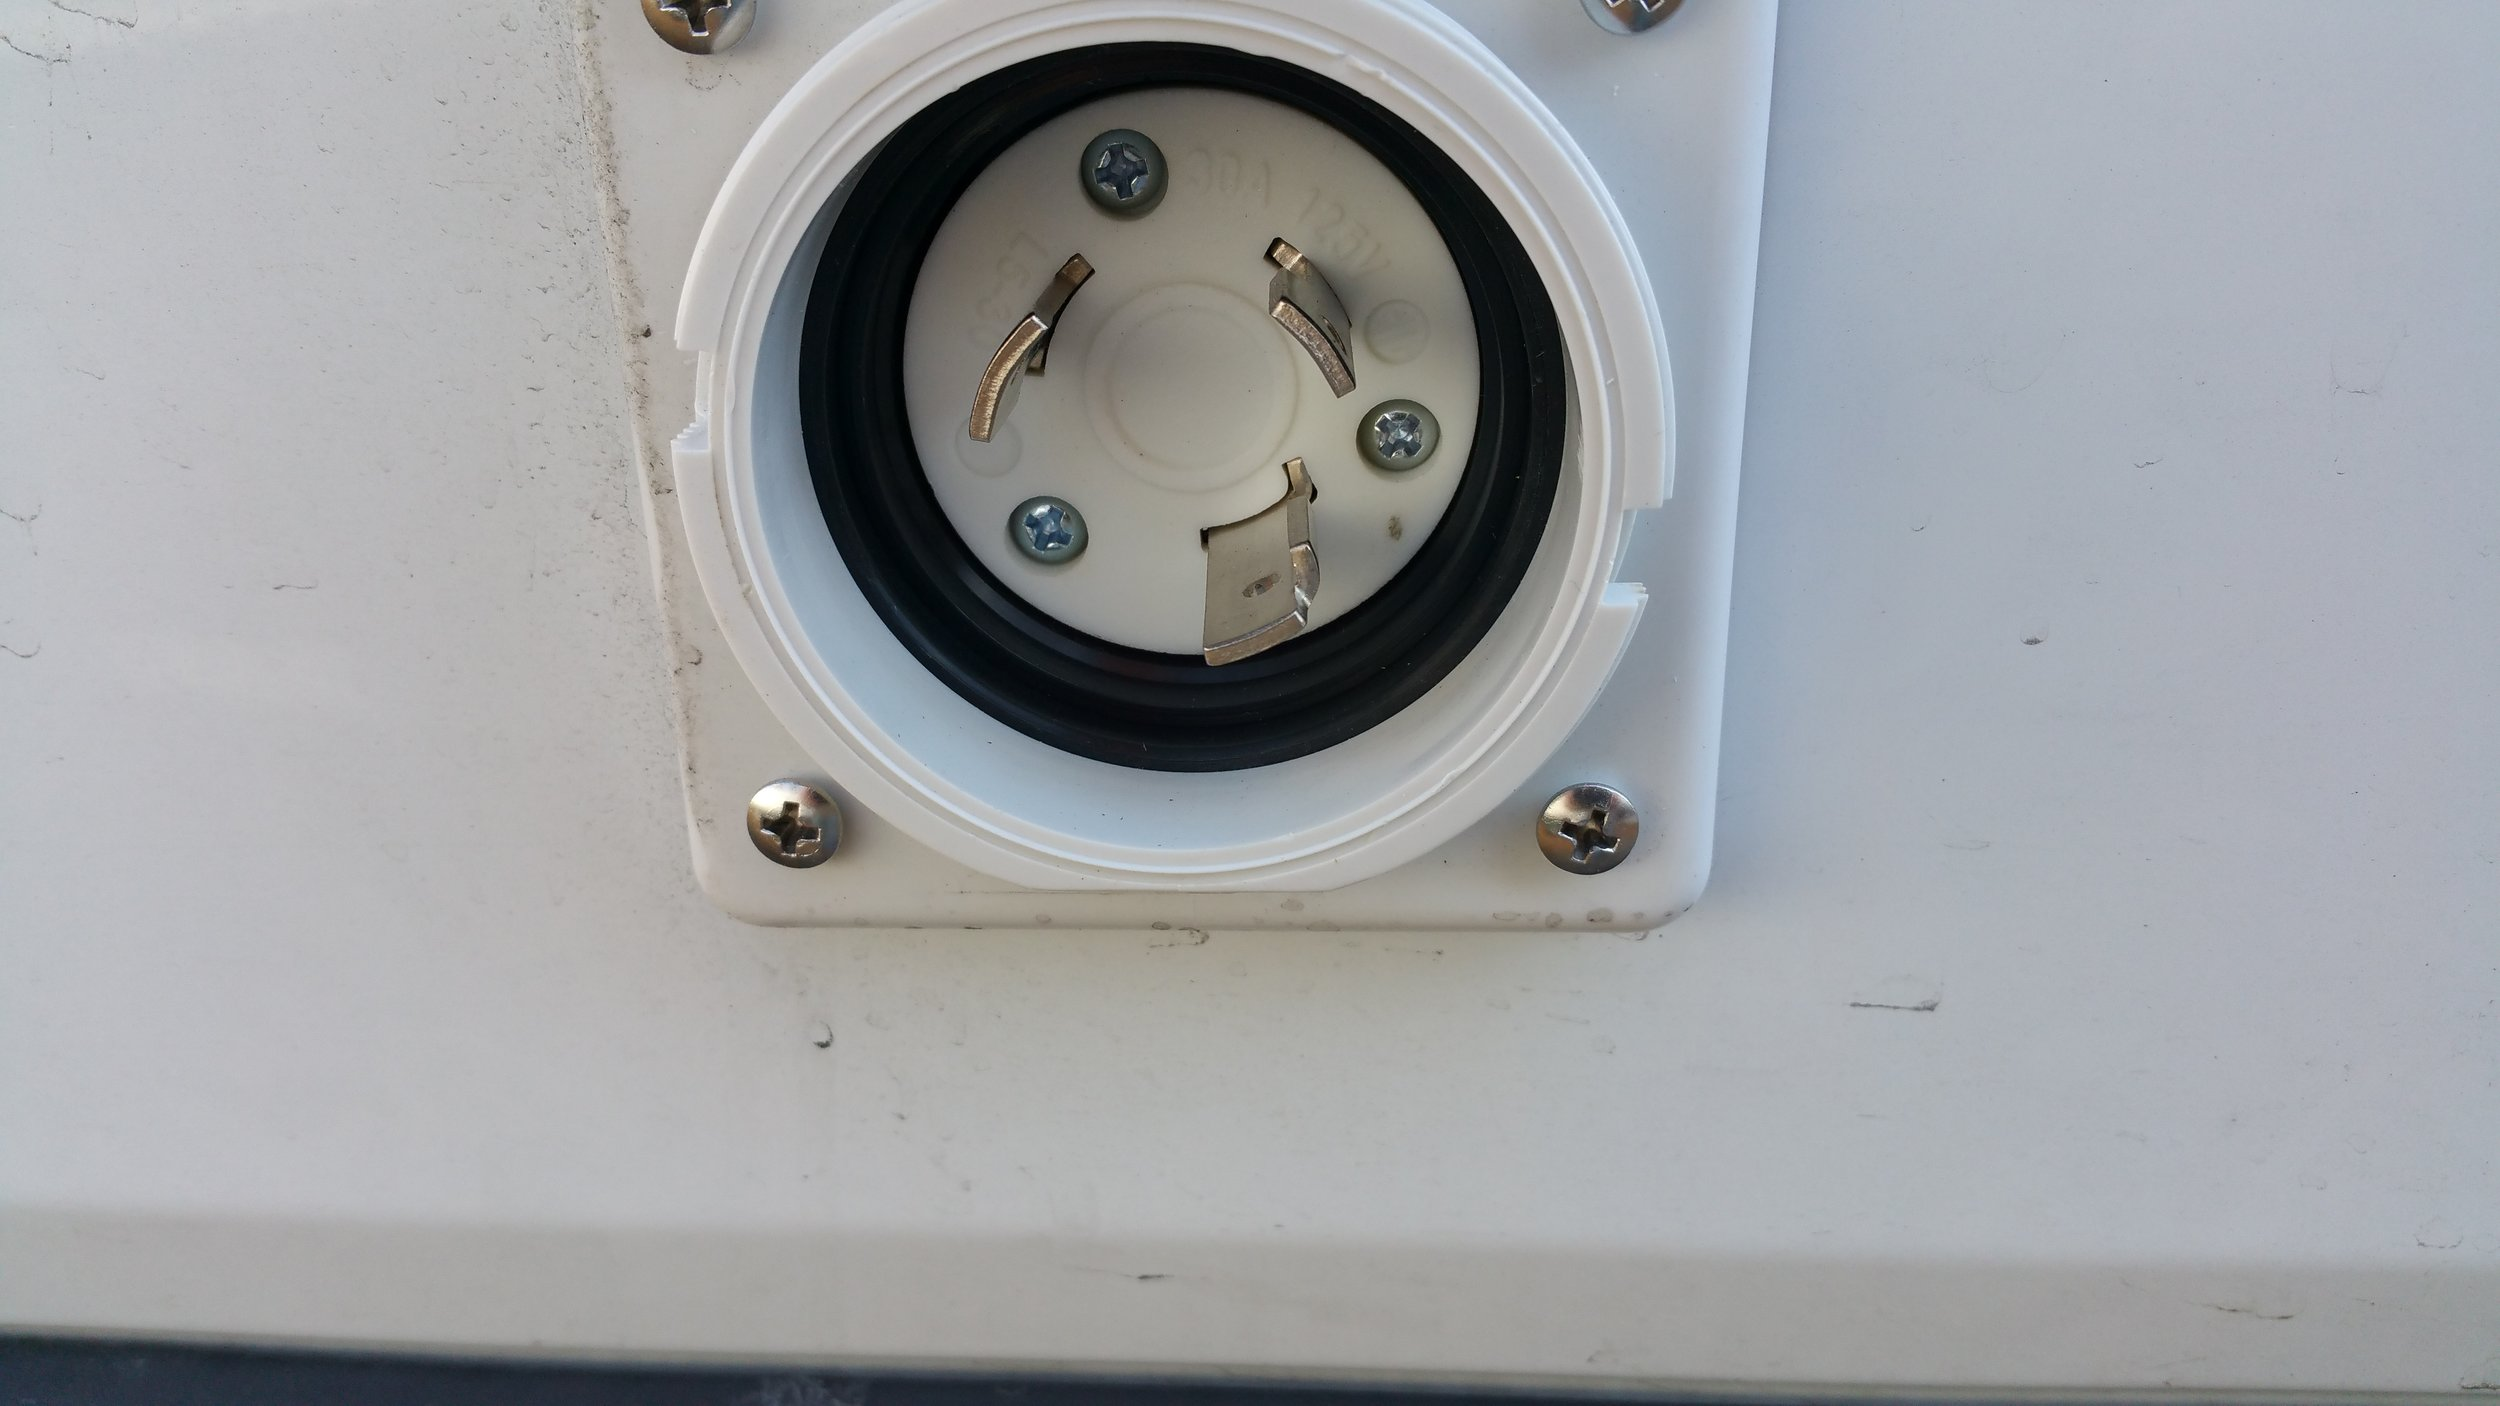 30 amp plug on driver's rear